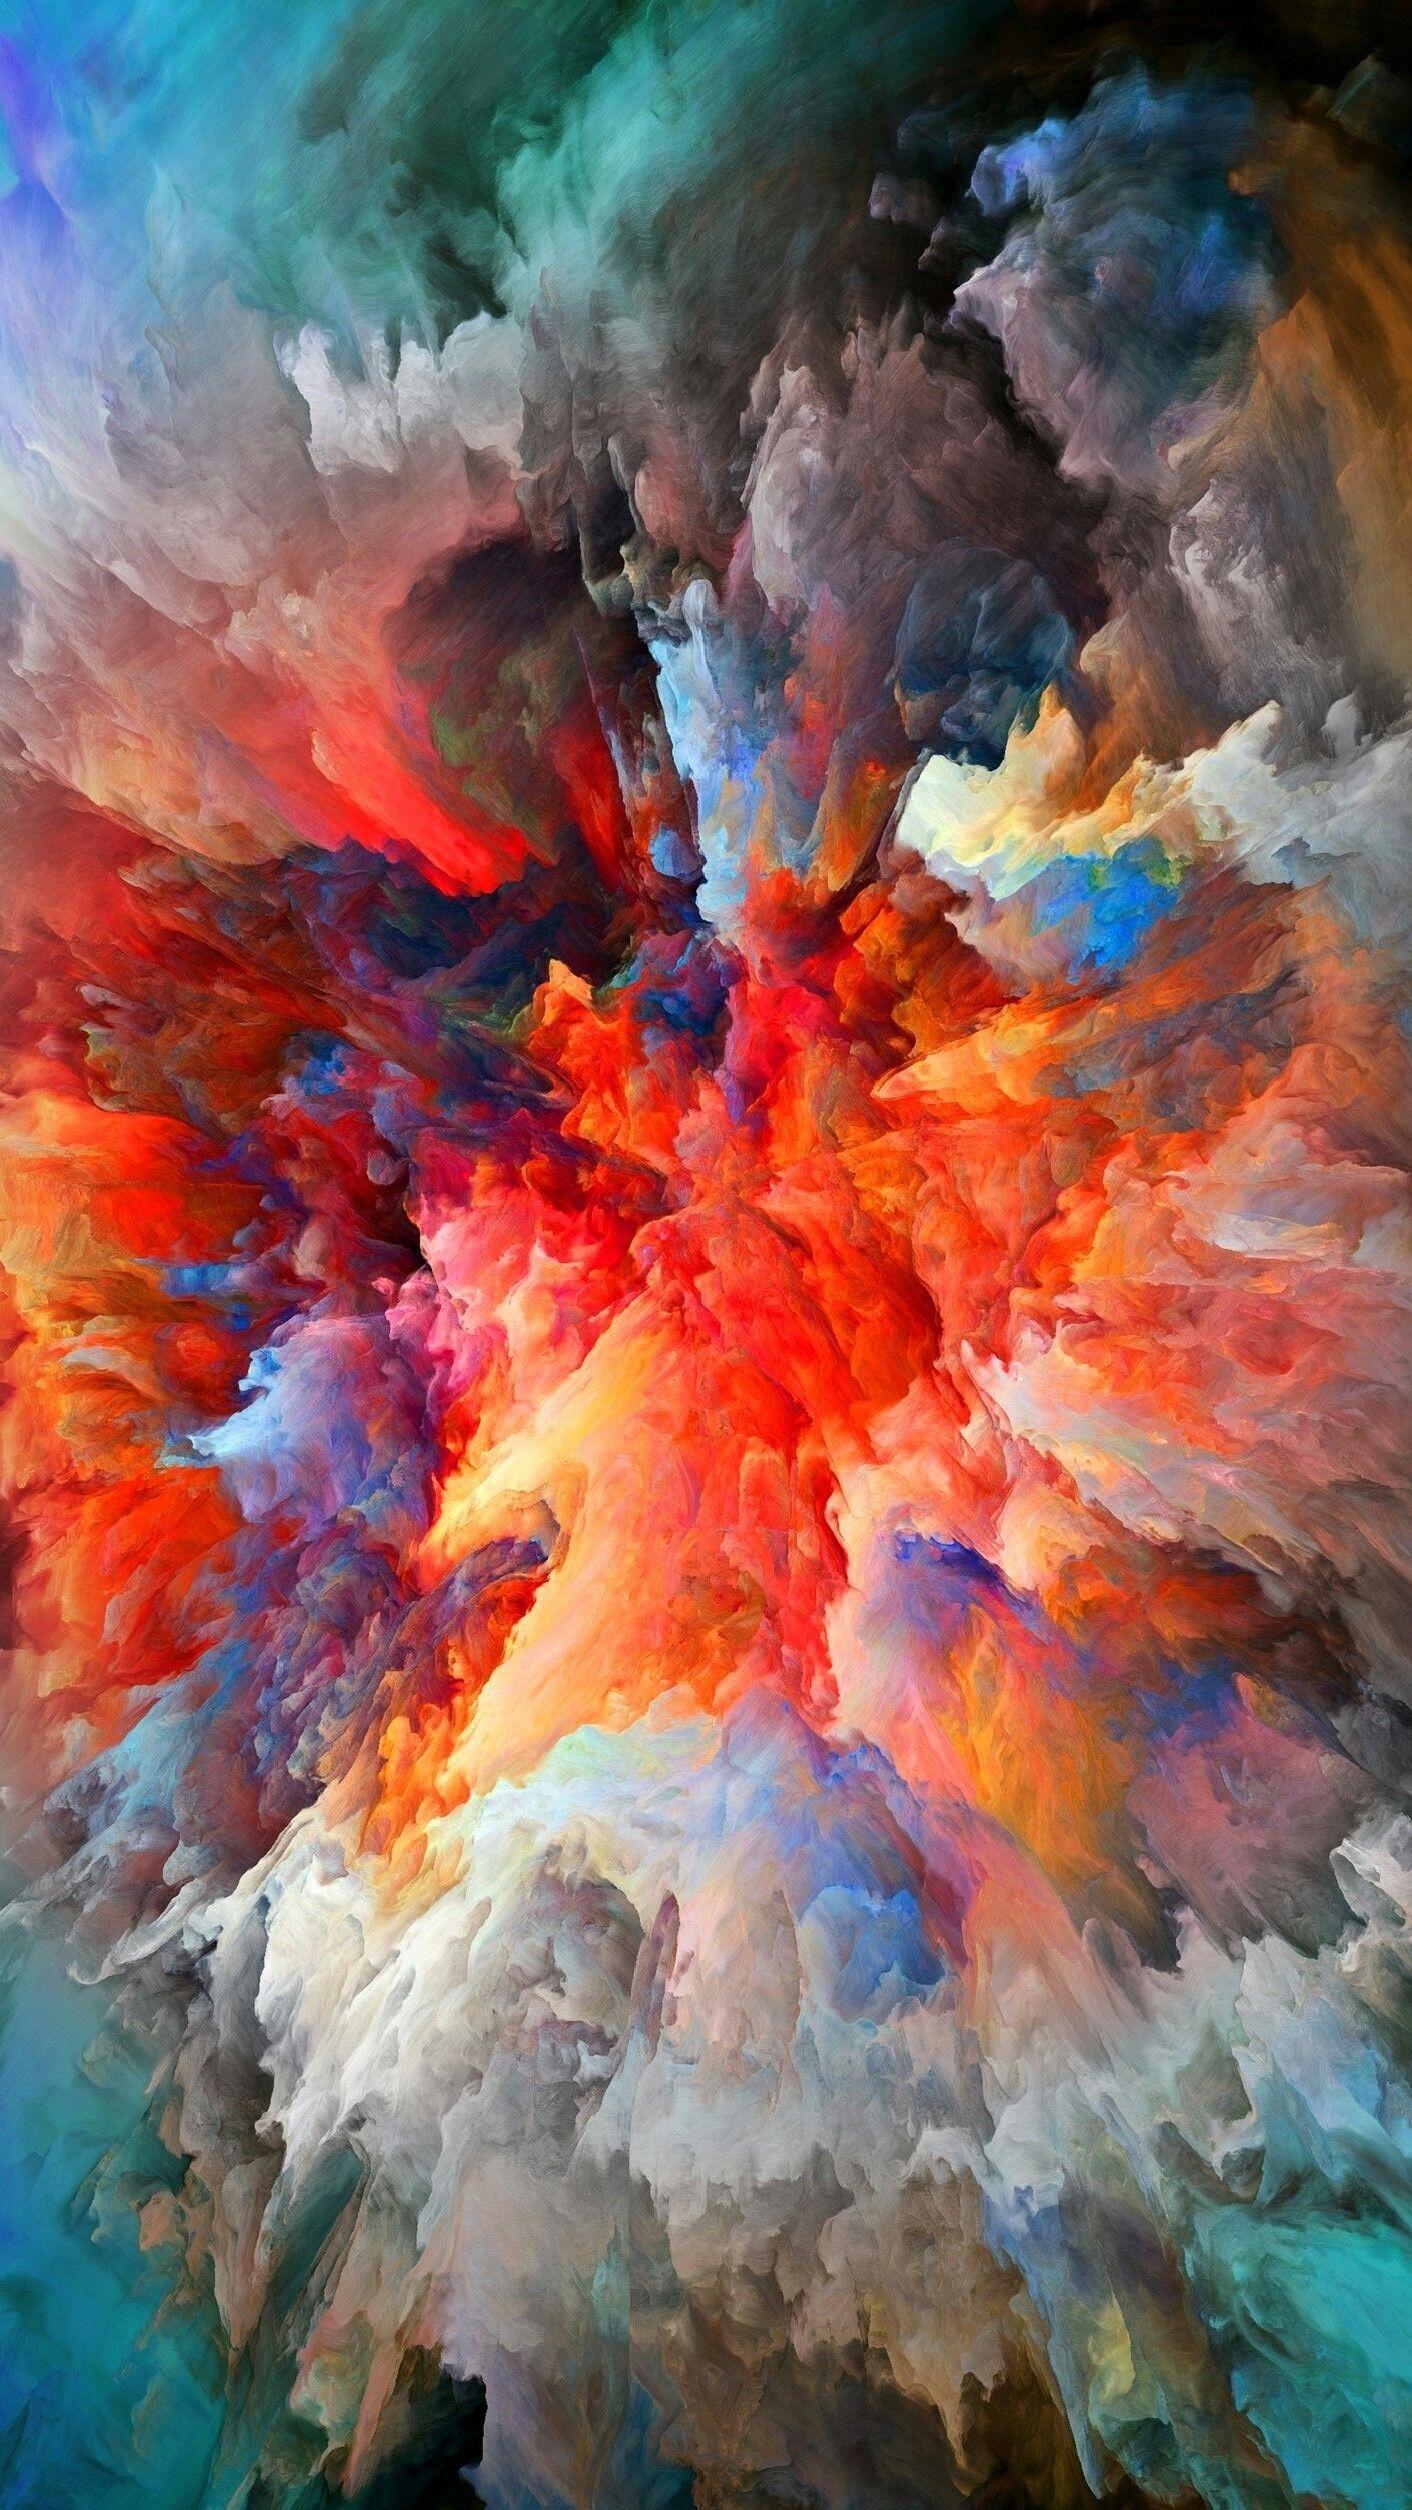 Inspirational Color Smoke Wallpaper Art wallpaper iphone